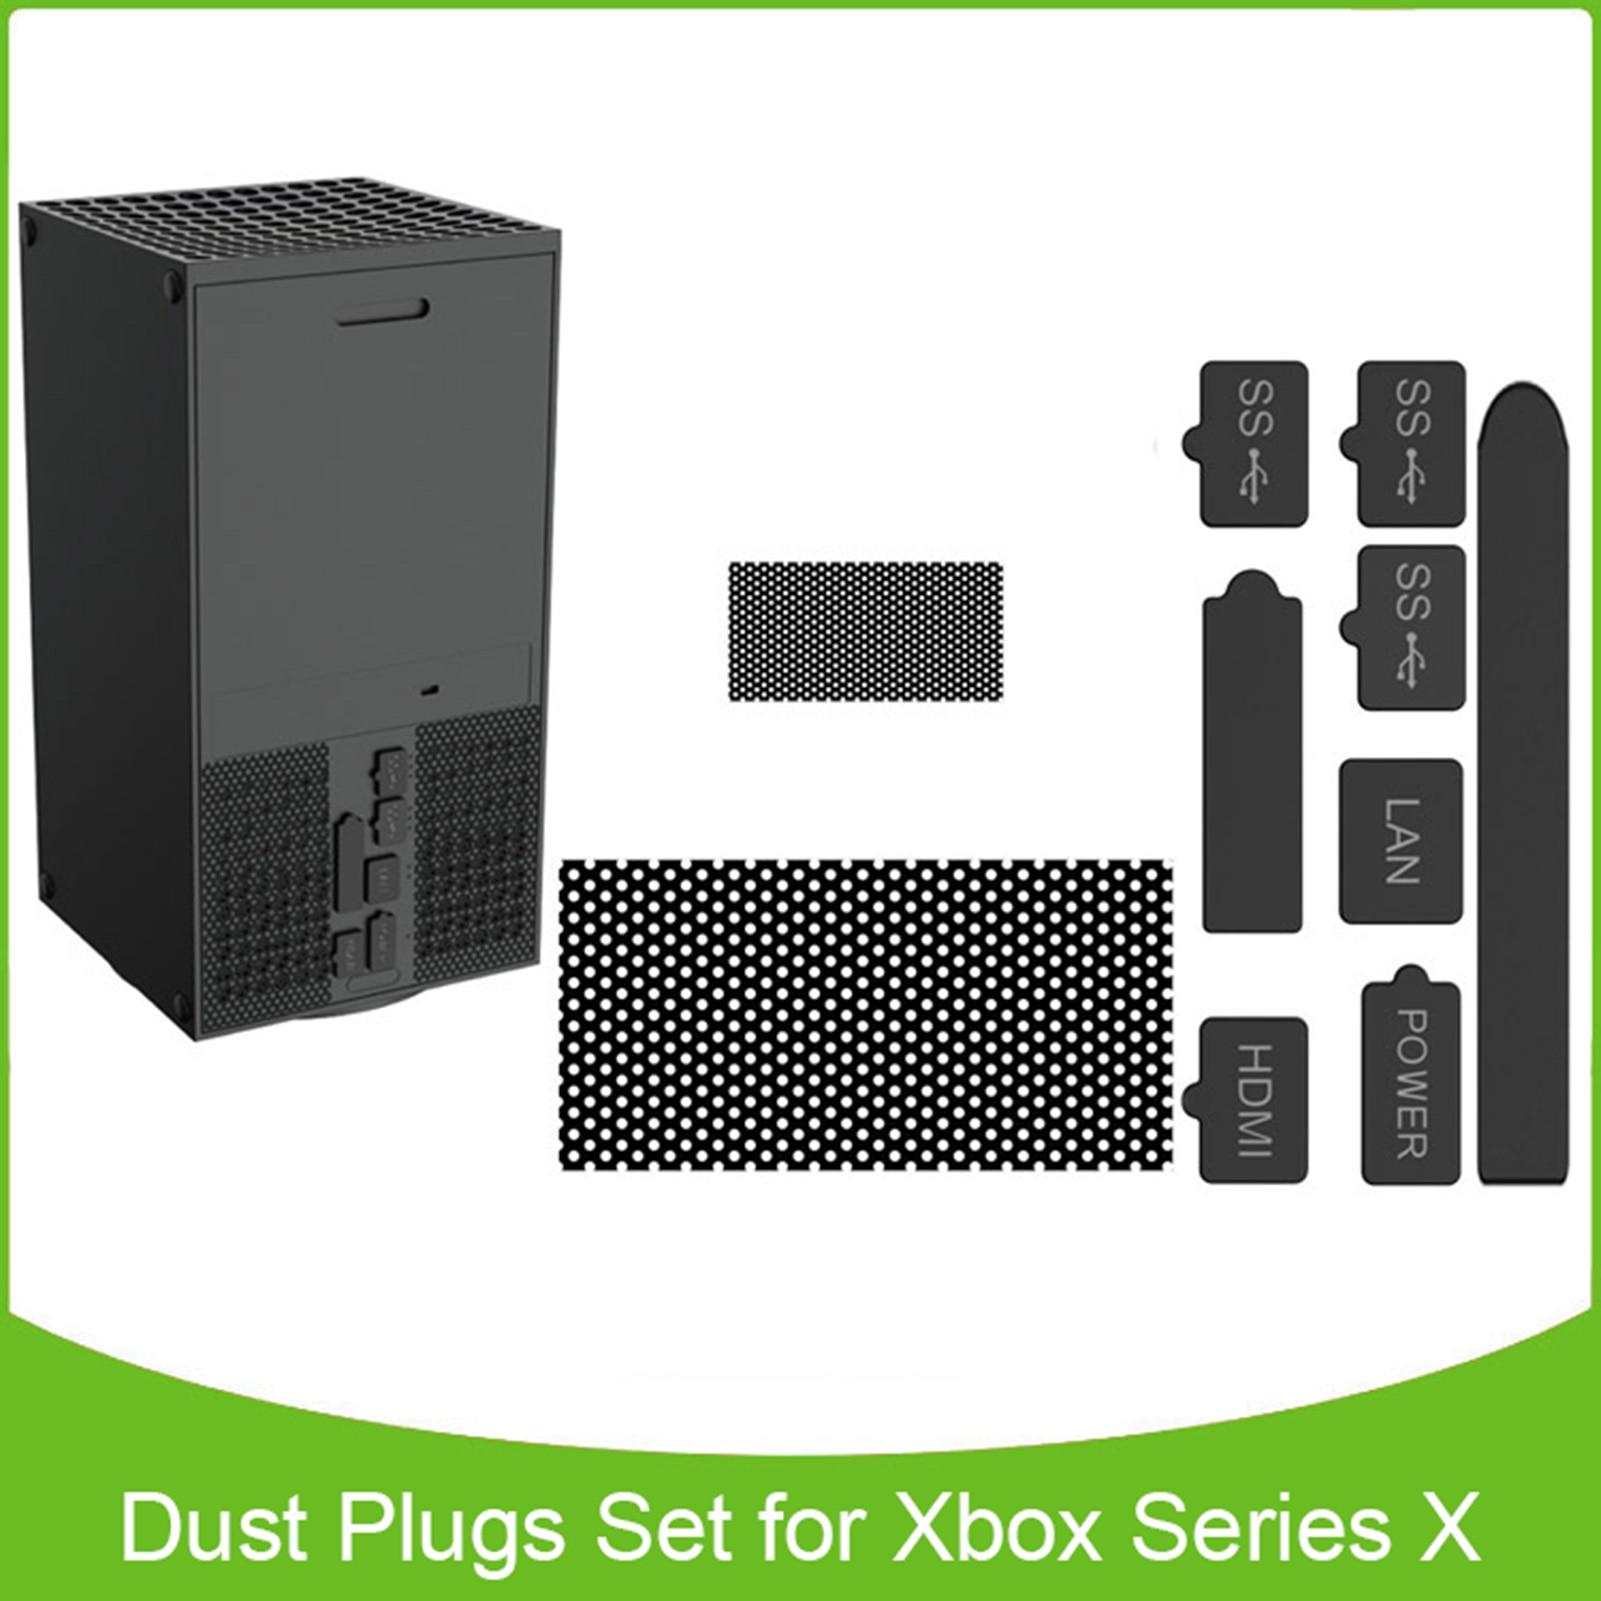 Red antipolvo adecuada para Xbox Series X, conjunto de 2 red antipolvo...